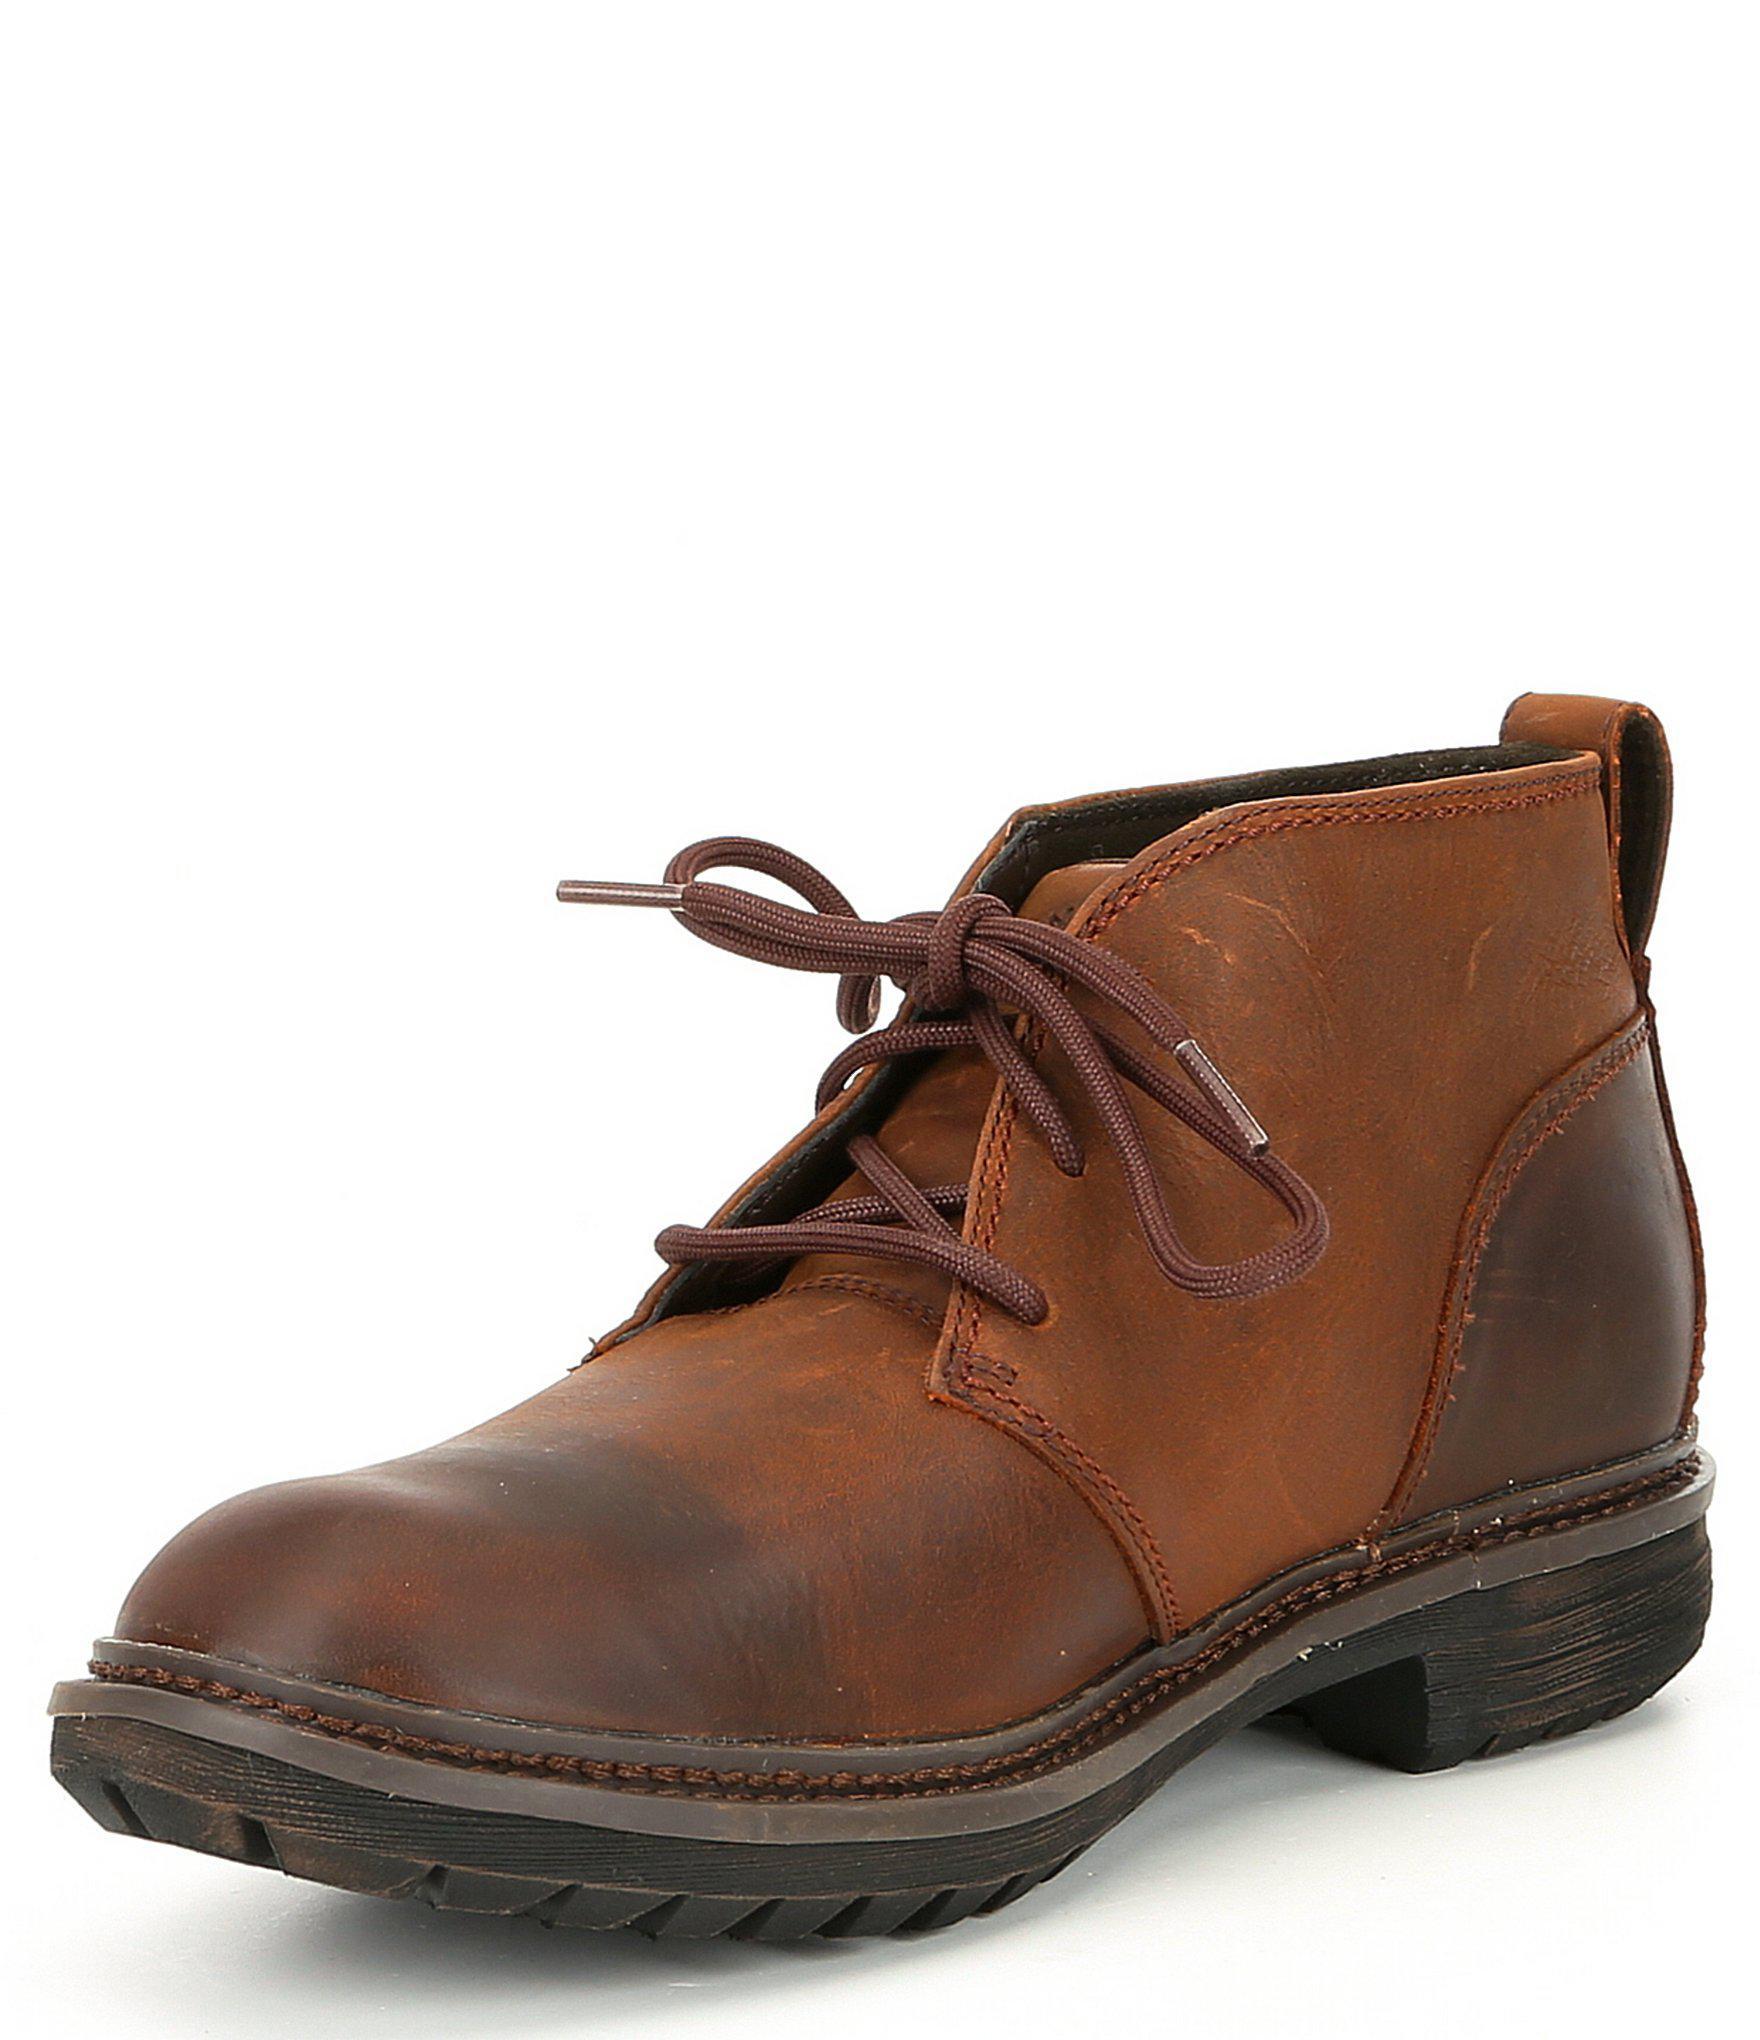 timberland logan bay boots \u003e Up to 67